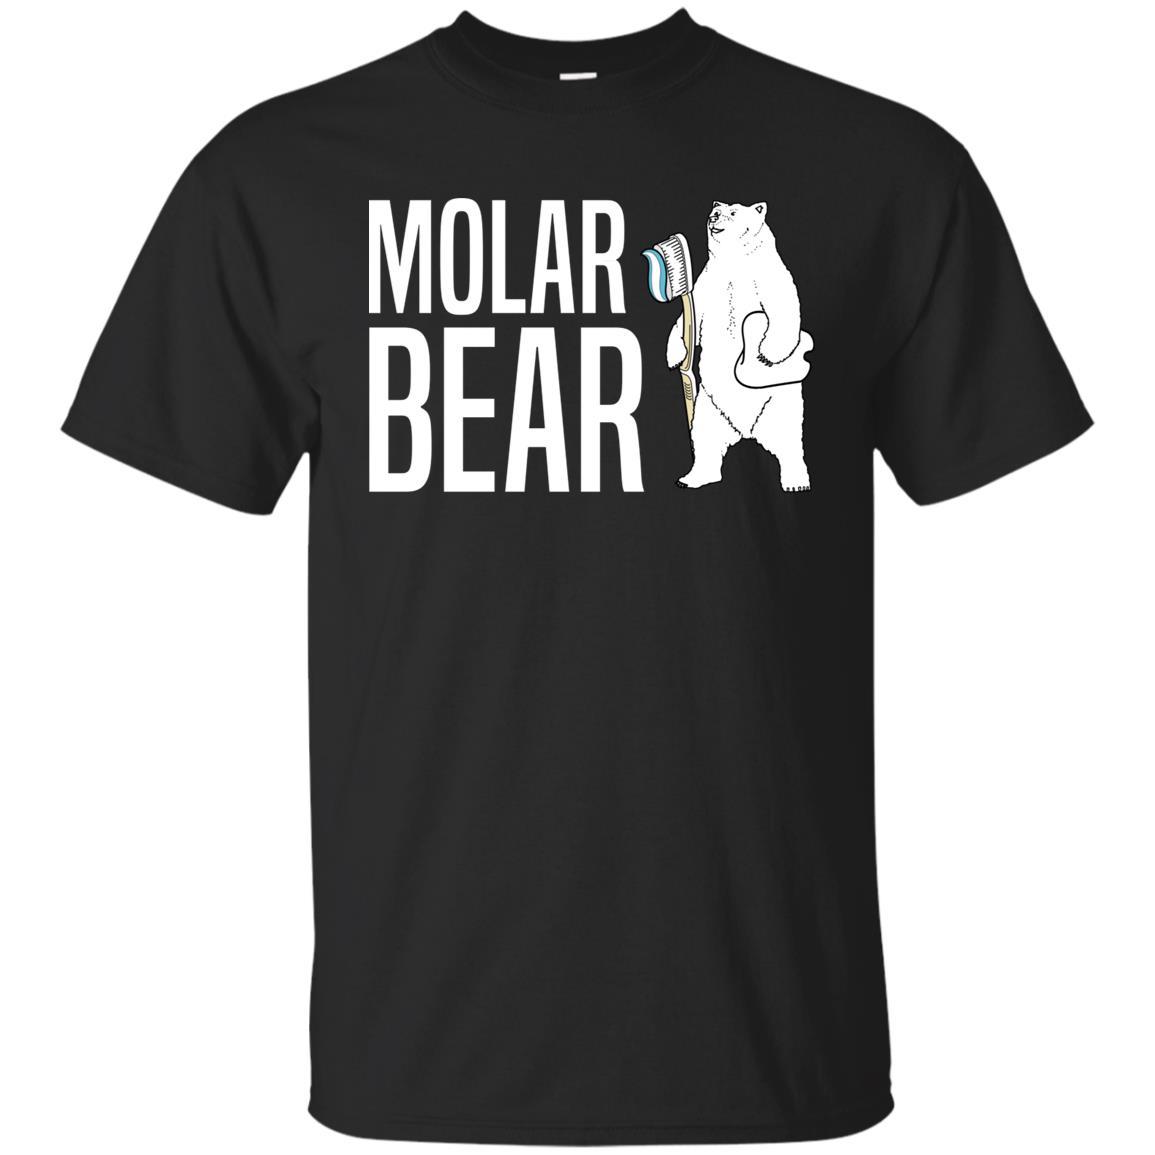 Molar Polar Bear, Dentist Hygienist Gift Unisex Short Sleeve